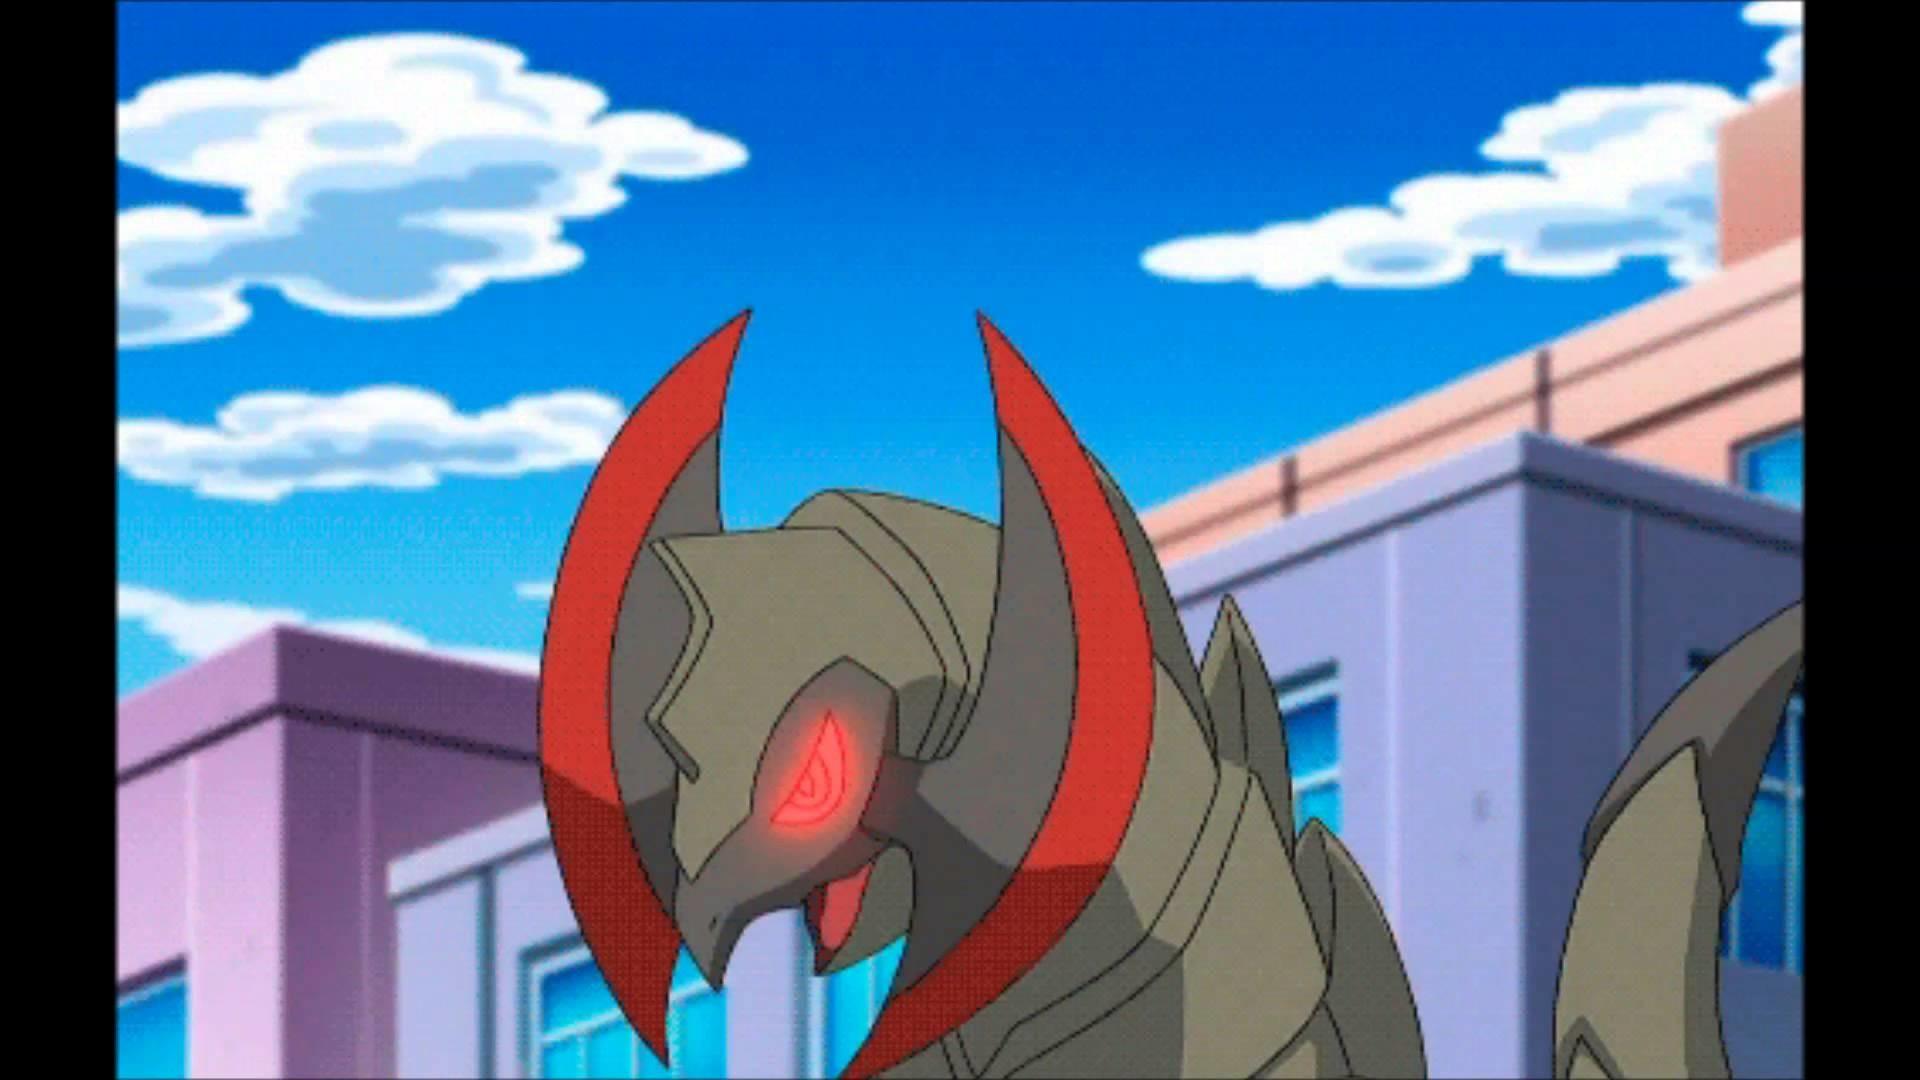 Res: 1920x1080, Shiny Haxorus Anime